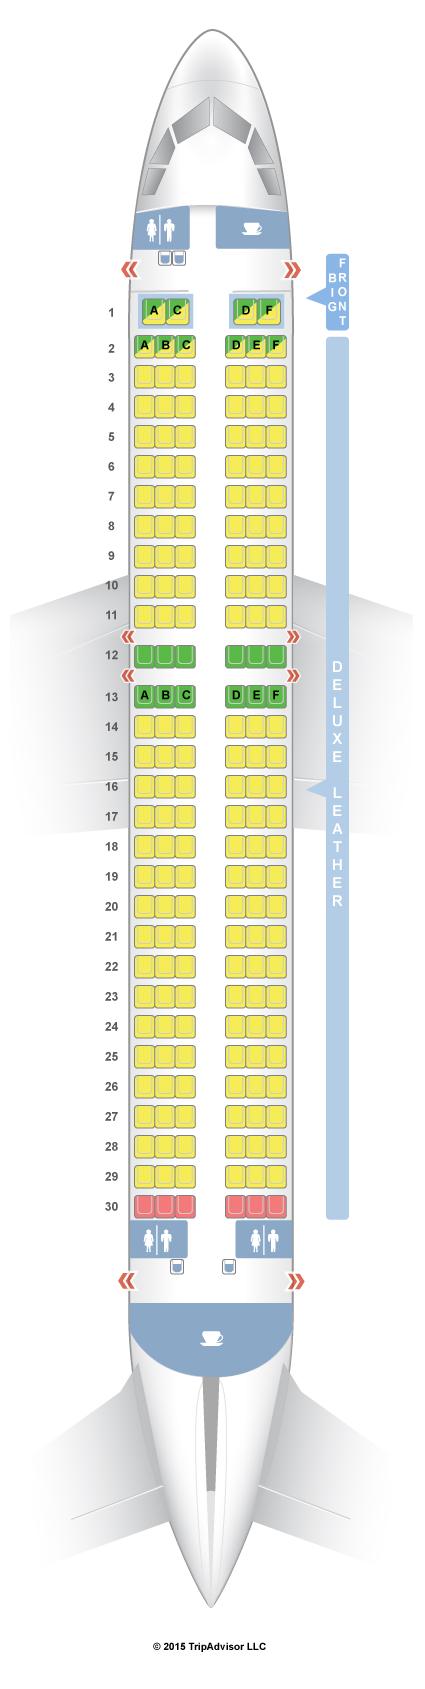 spirit airlines seating chart - Hunthankk